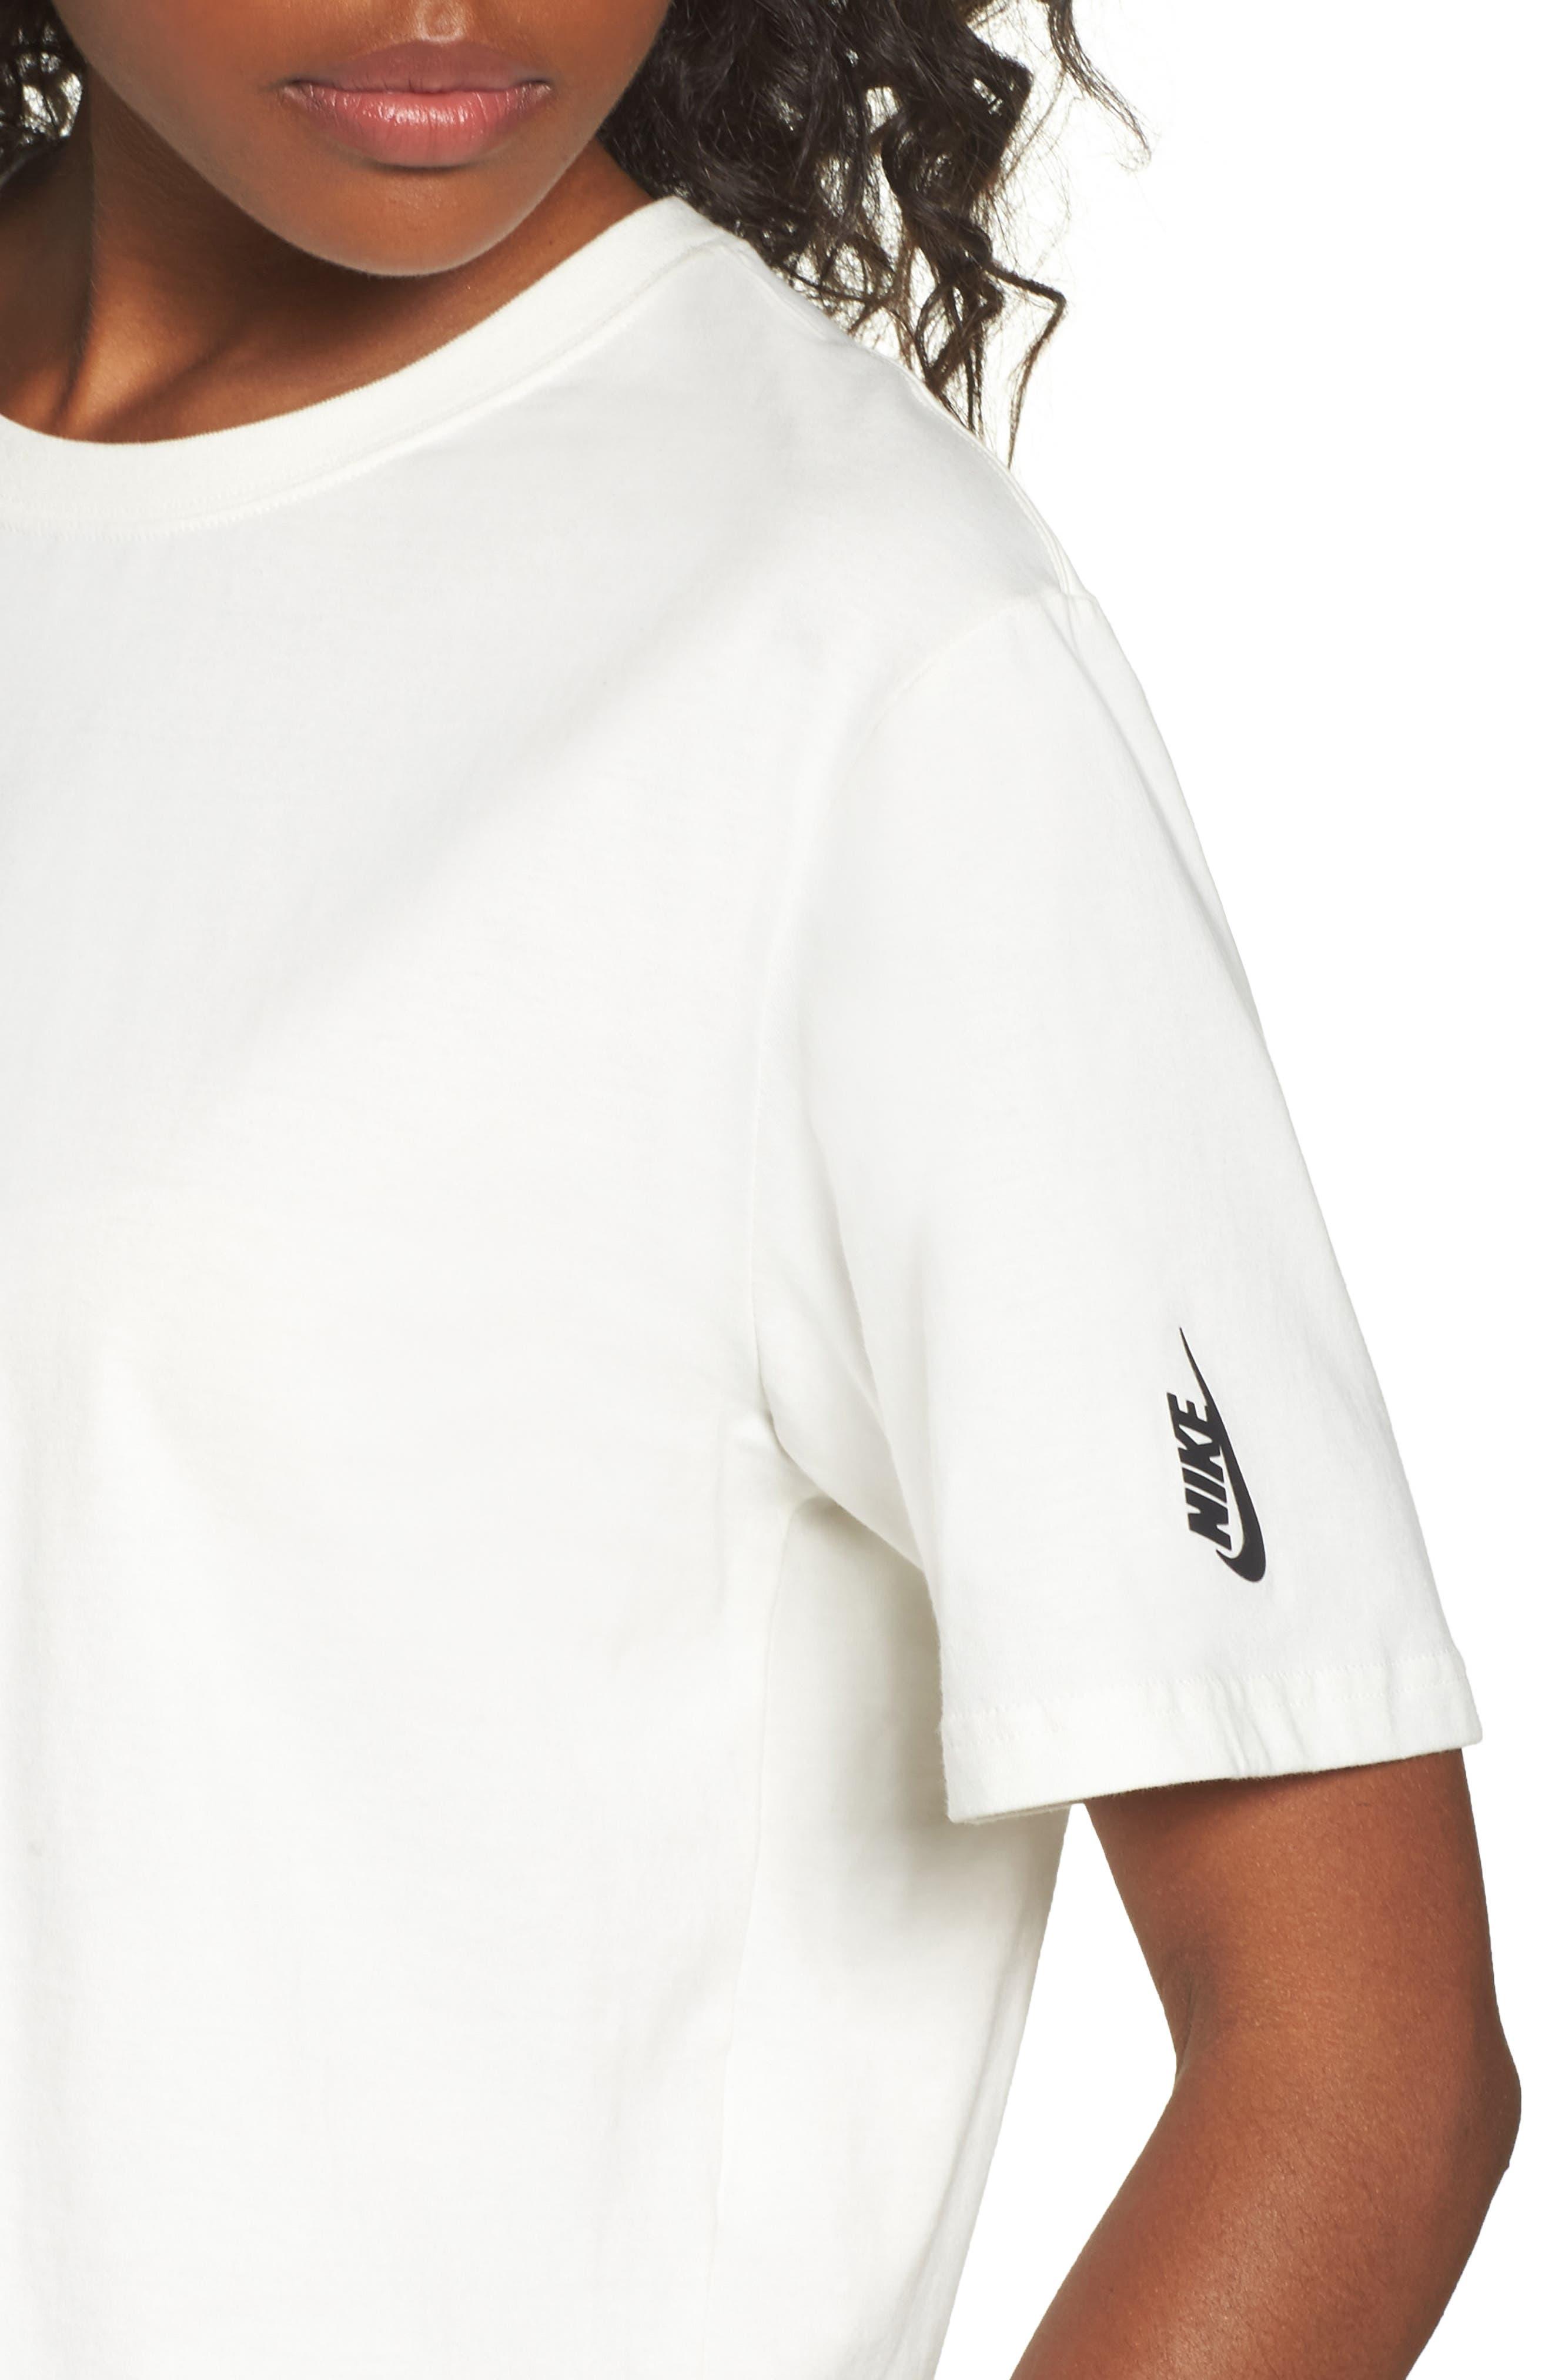 NikeLab Essentials Tee,                             Alternate thumbnail 4, color,                             Sail/ Black